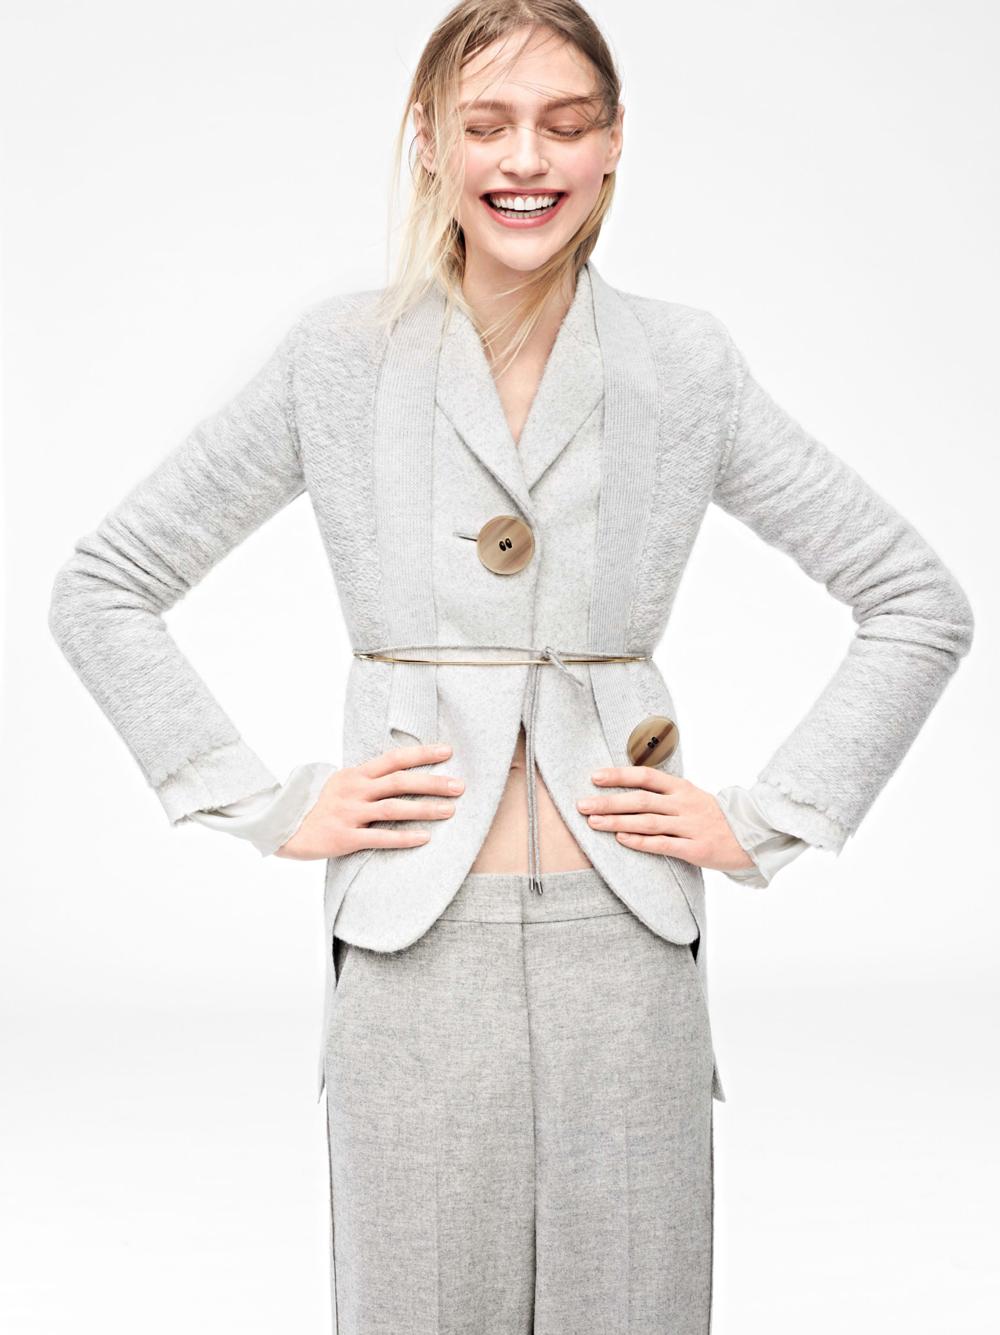 Vogue US March 2014 (photography: Karim Sadli, styling: Camilla Nickerson)